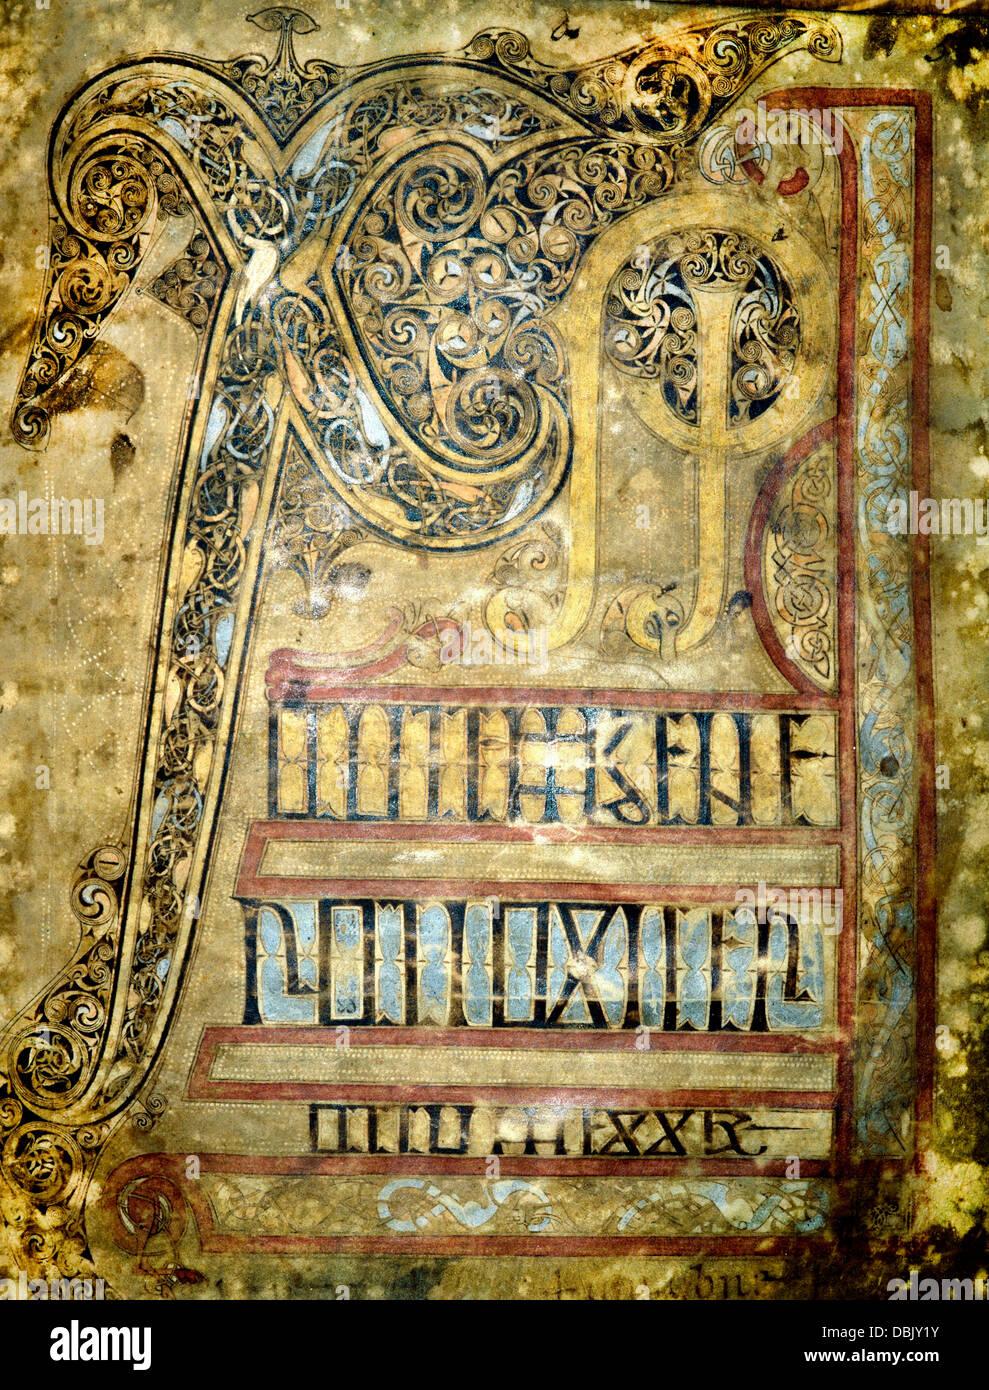 The Lichfield Gospels 720-30 AD  Chi Rho  page 5 Stock Photo